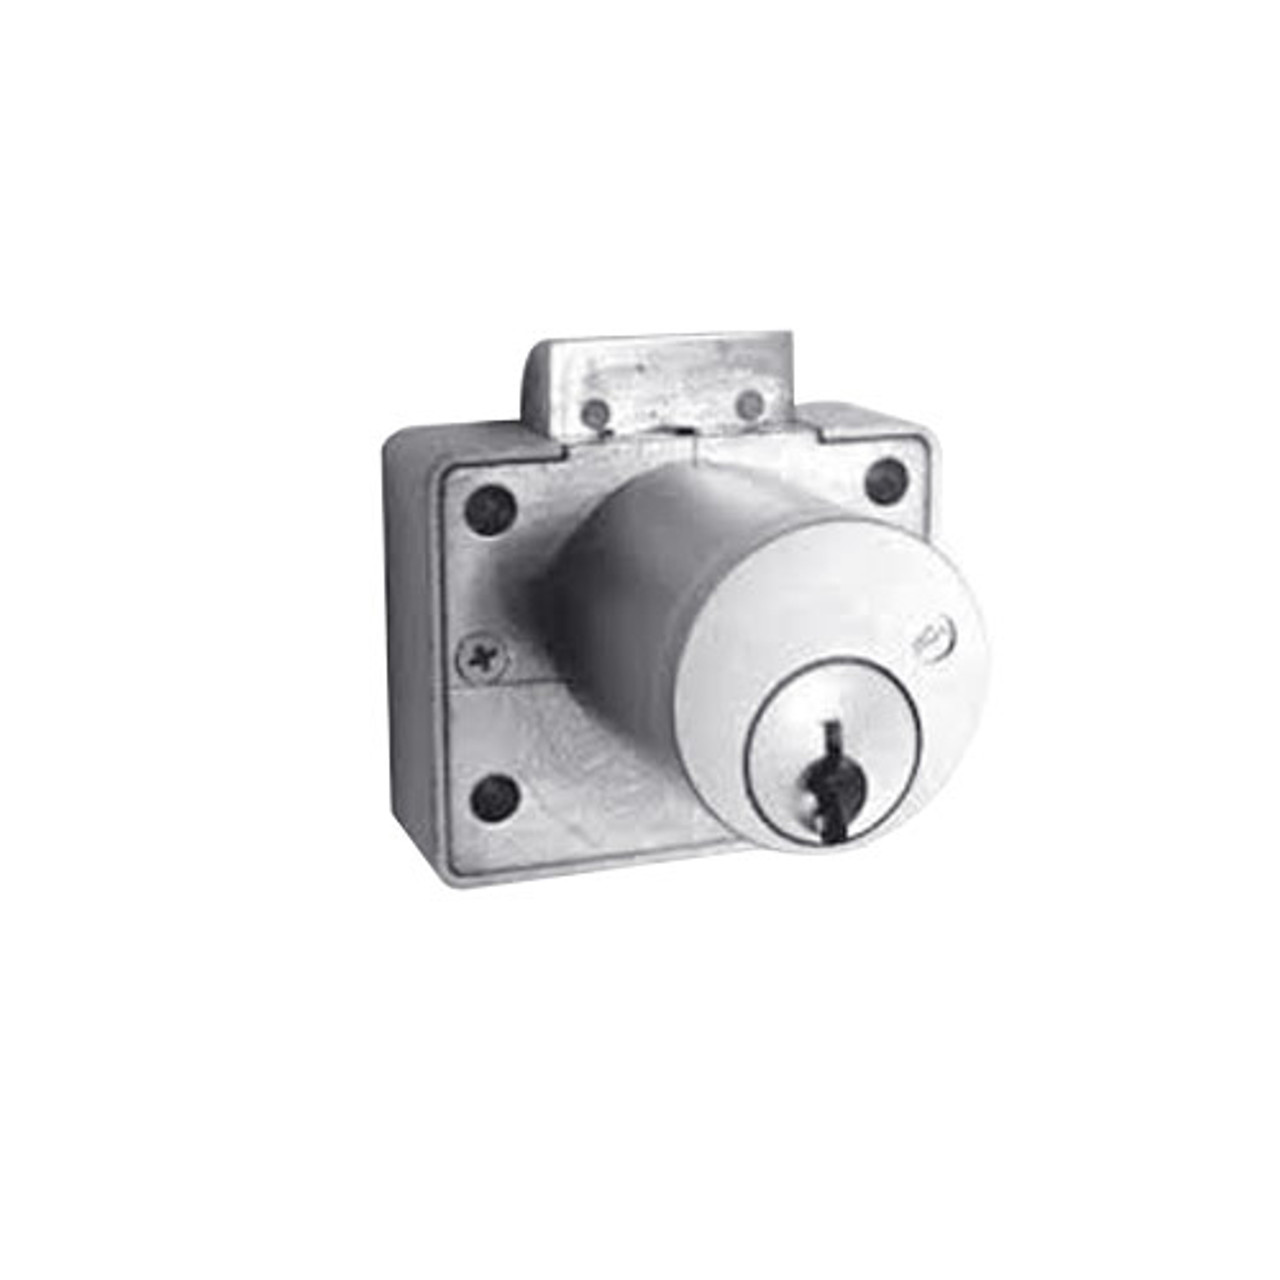 Olympus L78V-VH-KD-26D-1-1/8 Drawer Latch Cabinet Lock in Satin Chrome Finish